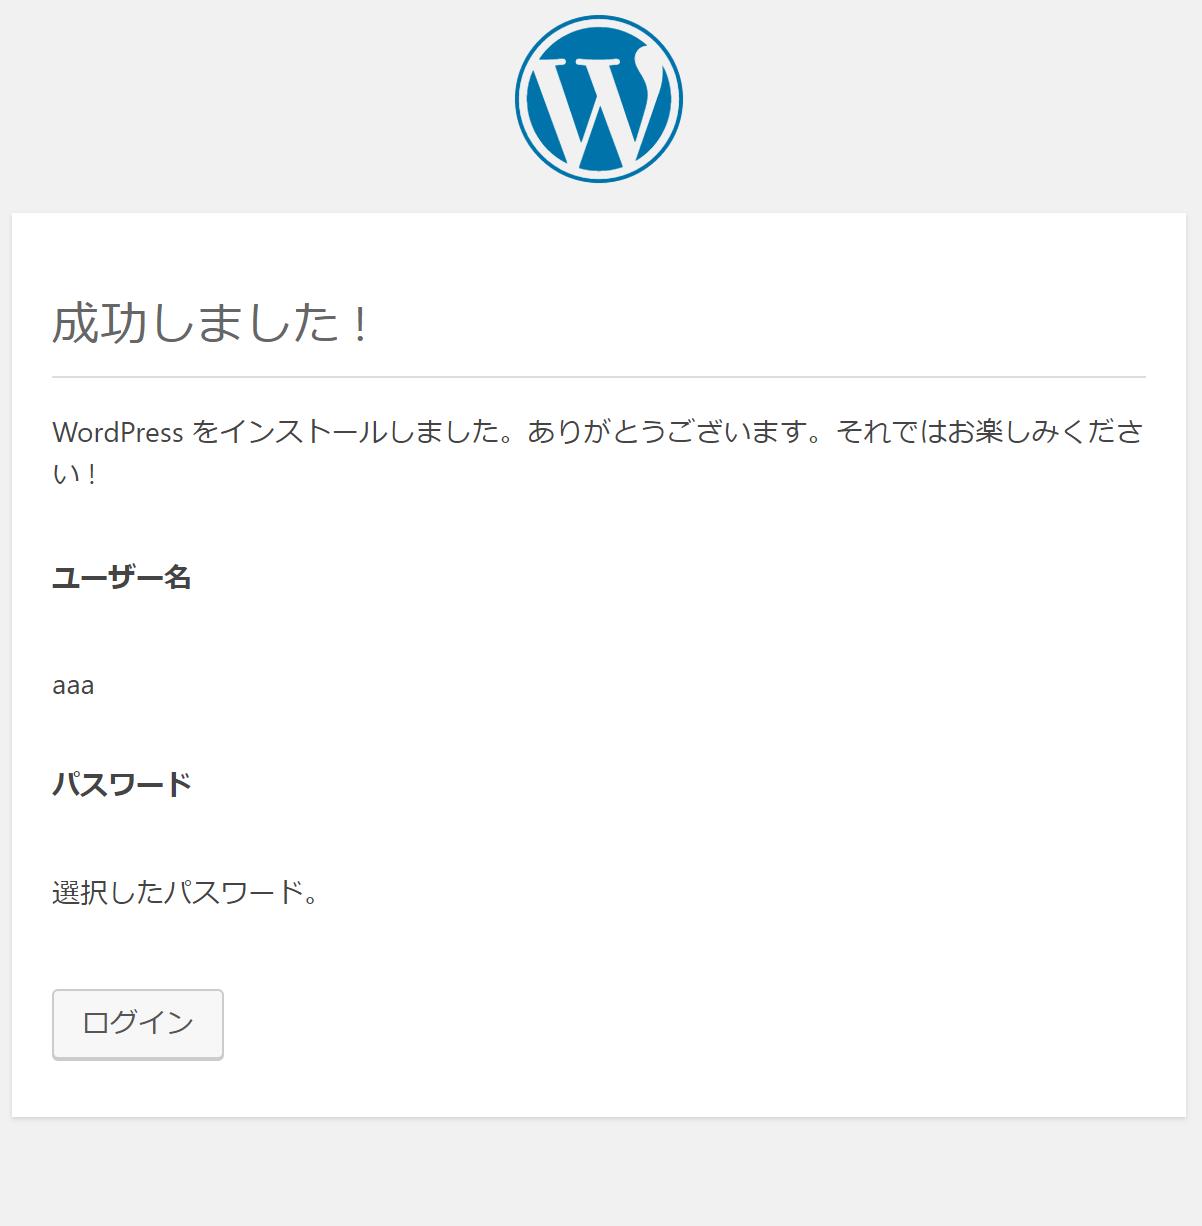 wordpress success - Wordpressをローカル環境にインストールする方法は初心者には難しいのでおすすめできない